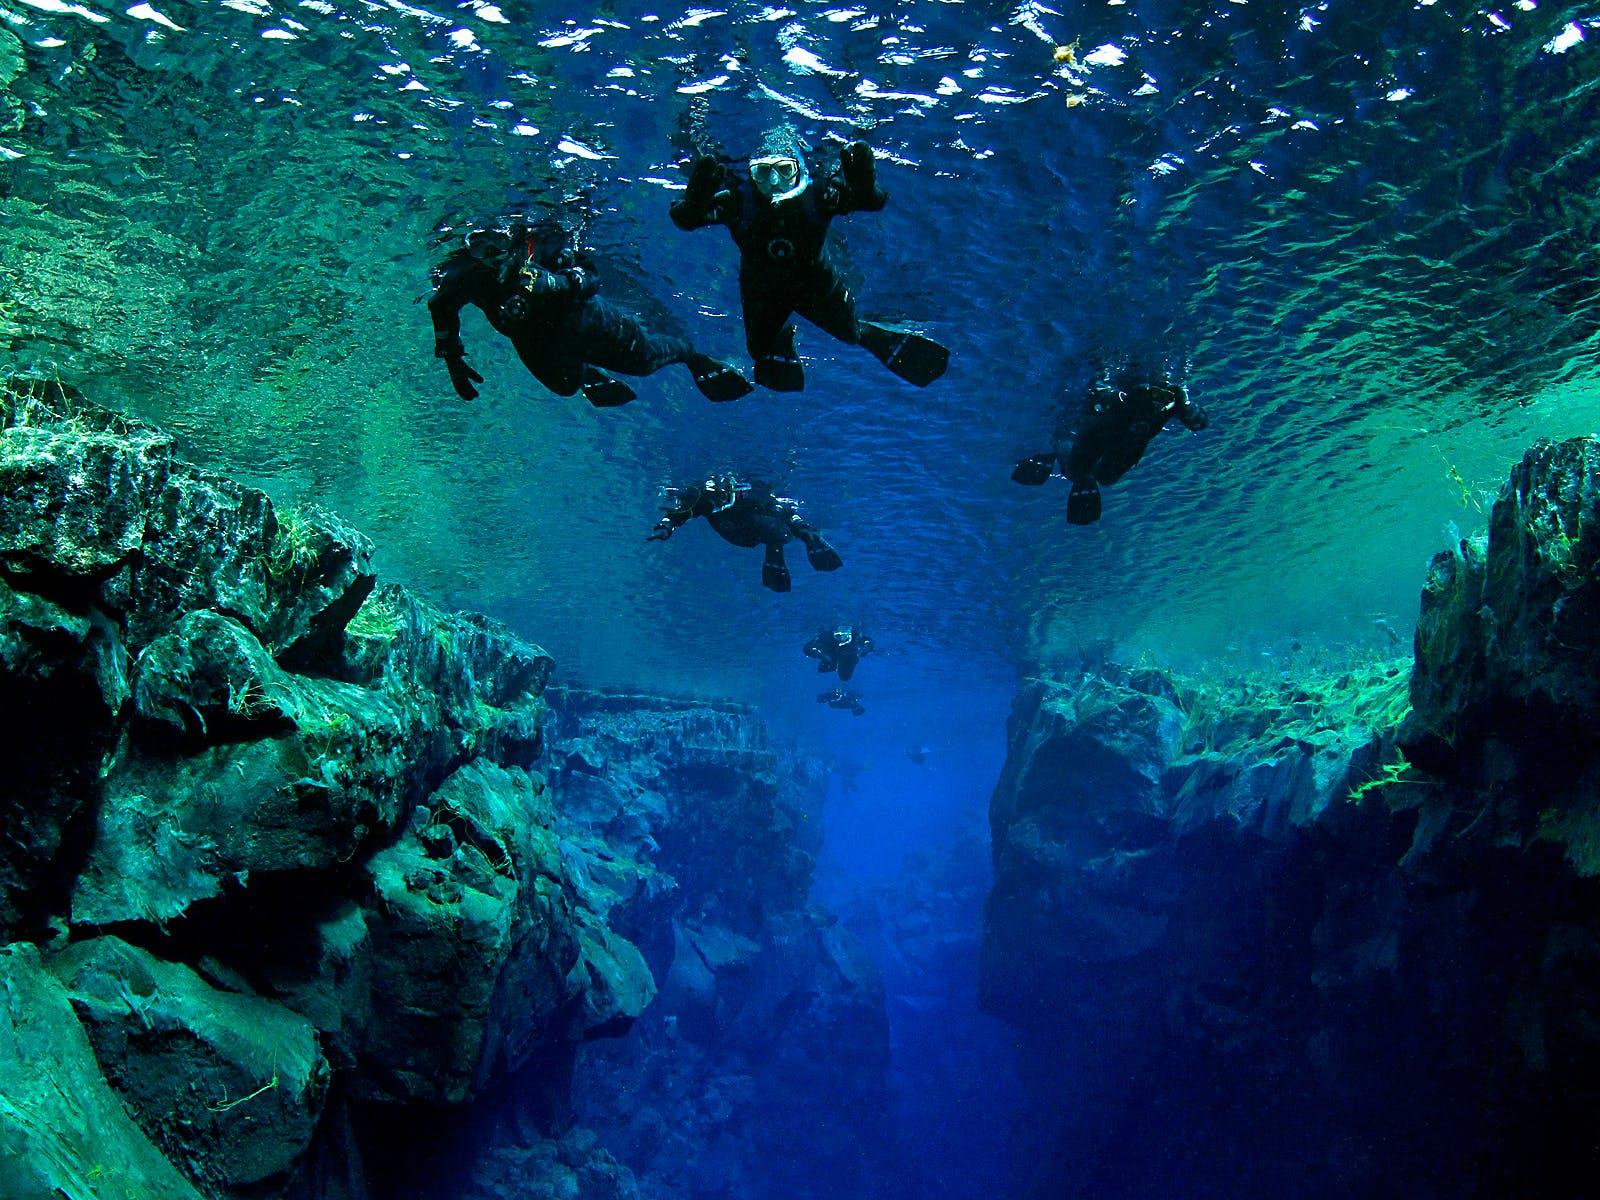 Snorkel a través de dos continentes en la grieta de Silfra en el Parque Nacional Þingvellir.